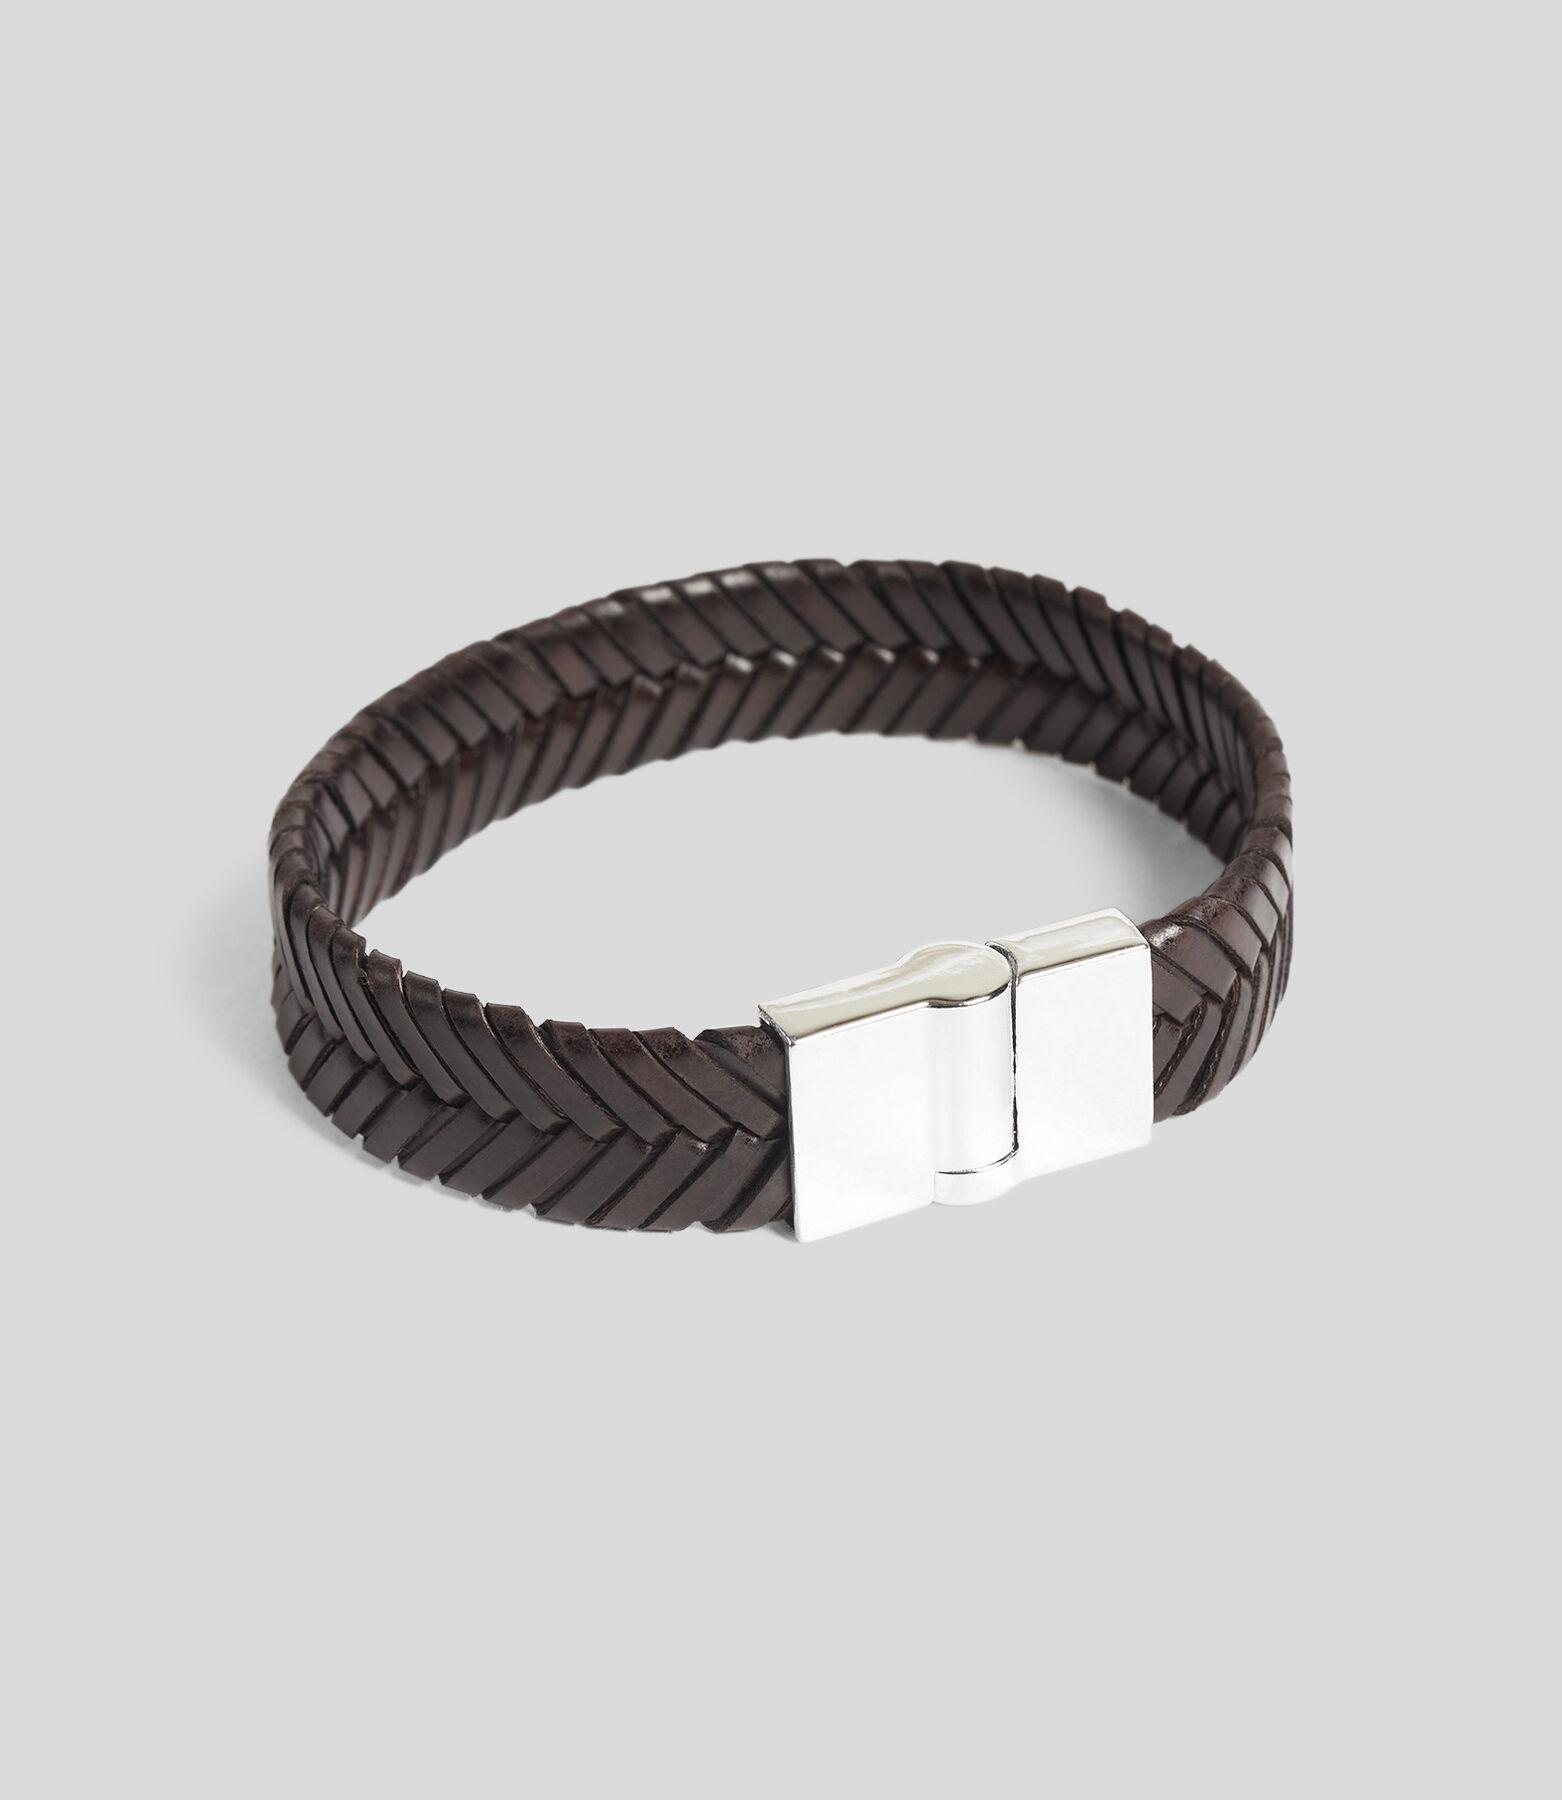 Bracelet tressé homme